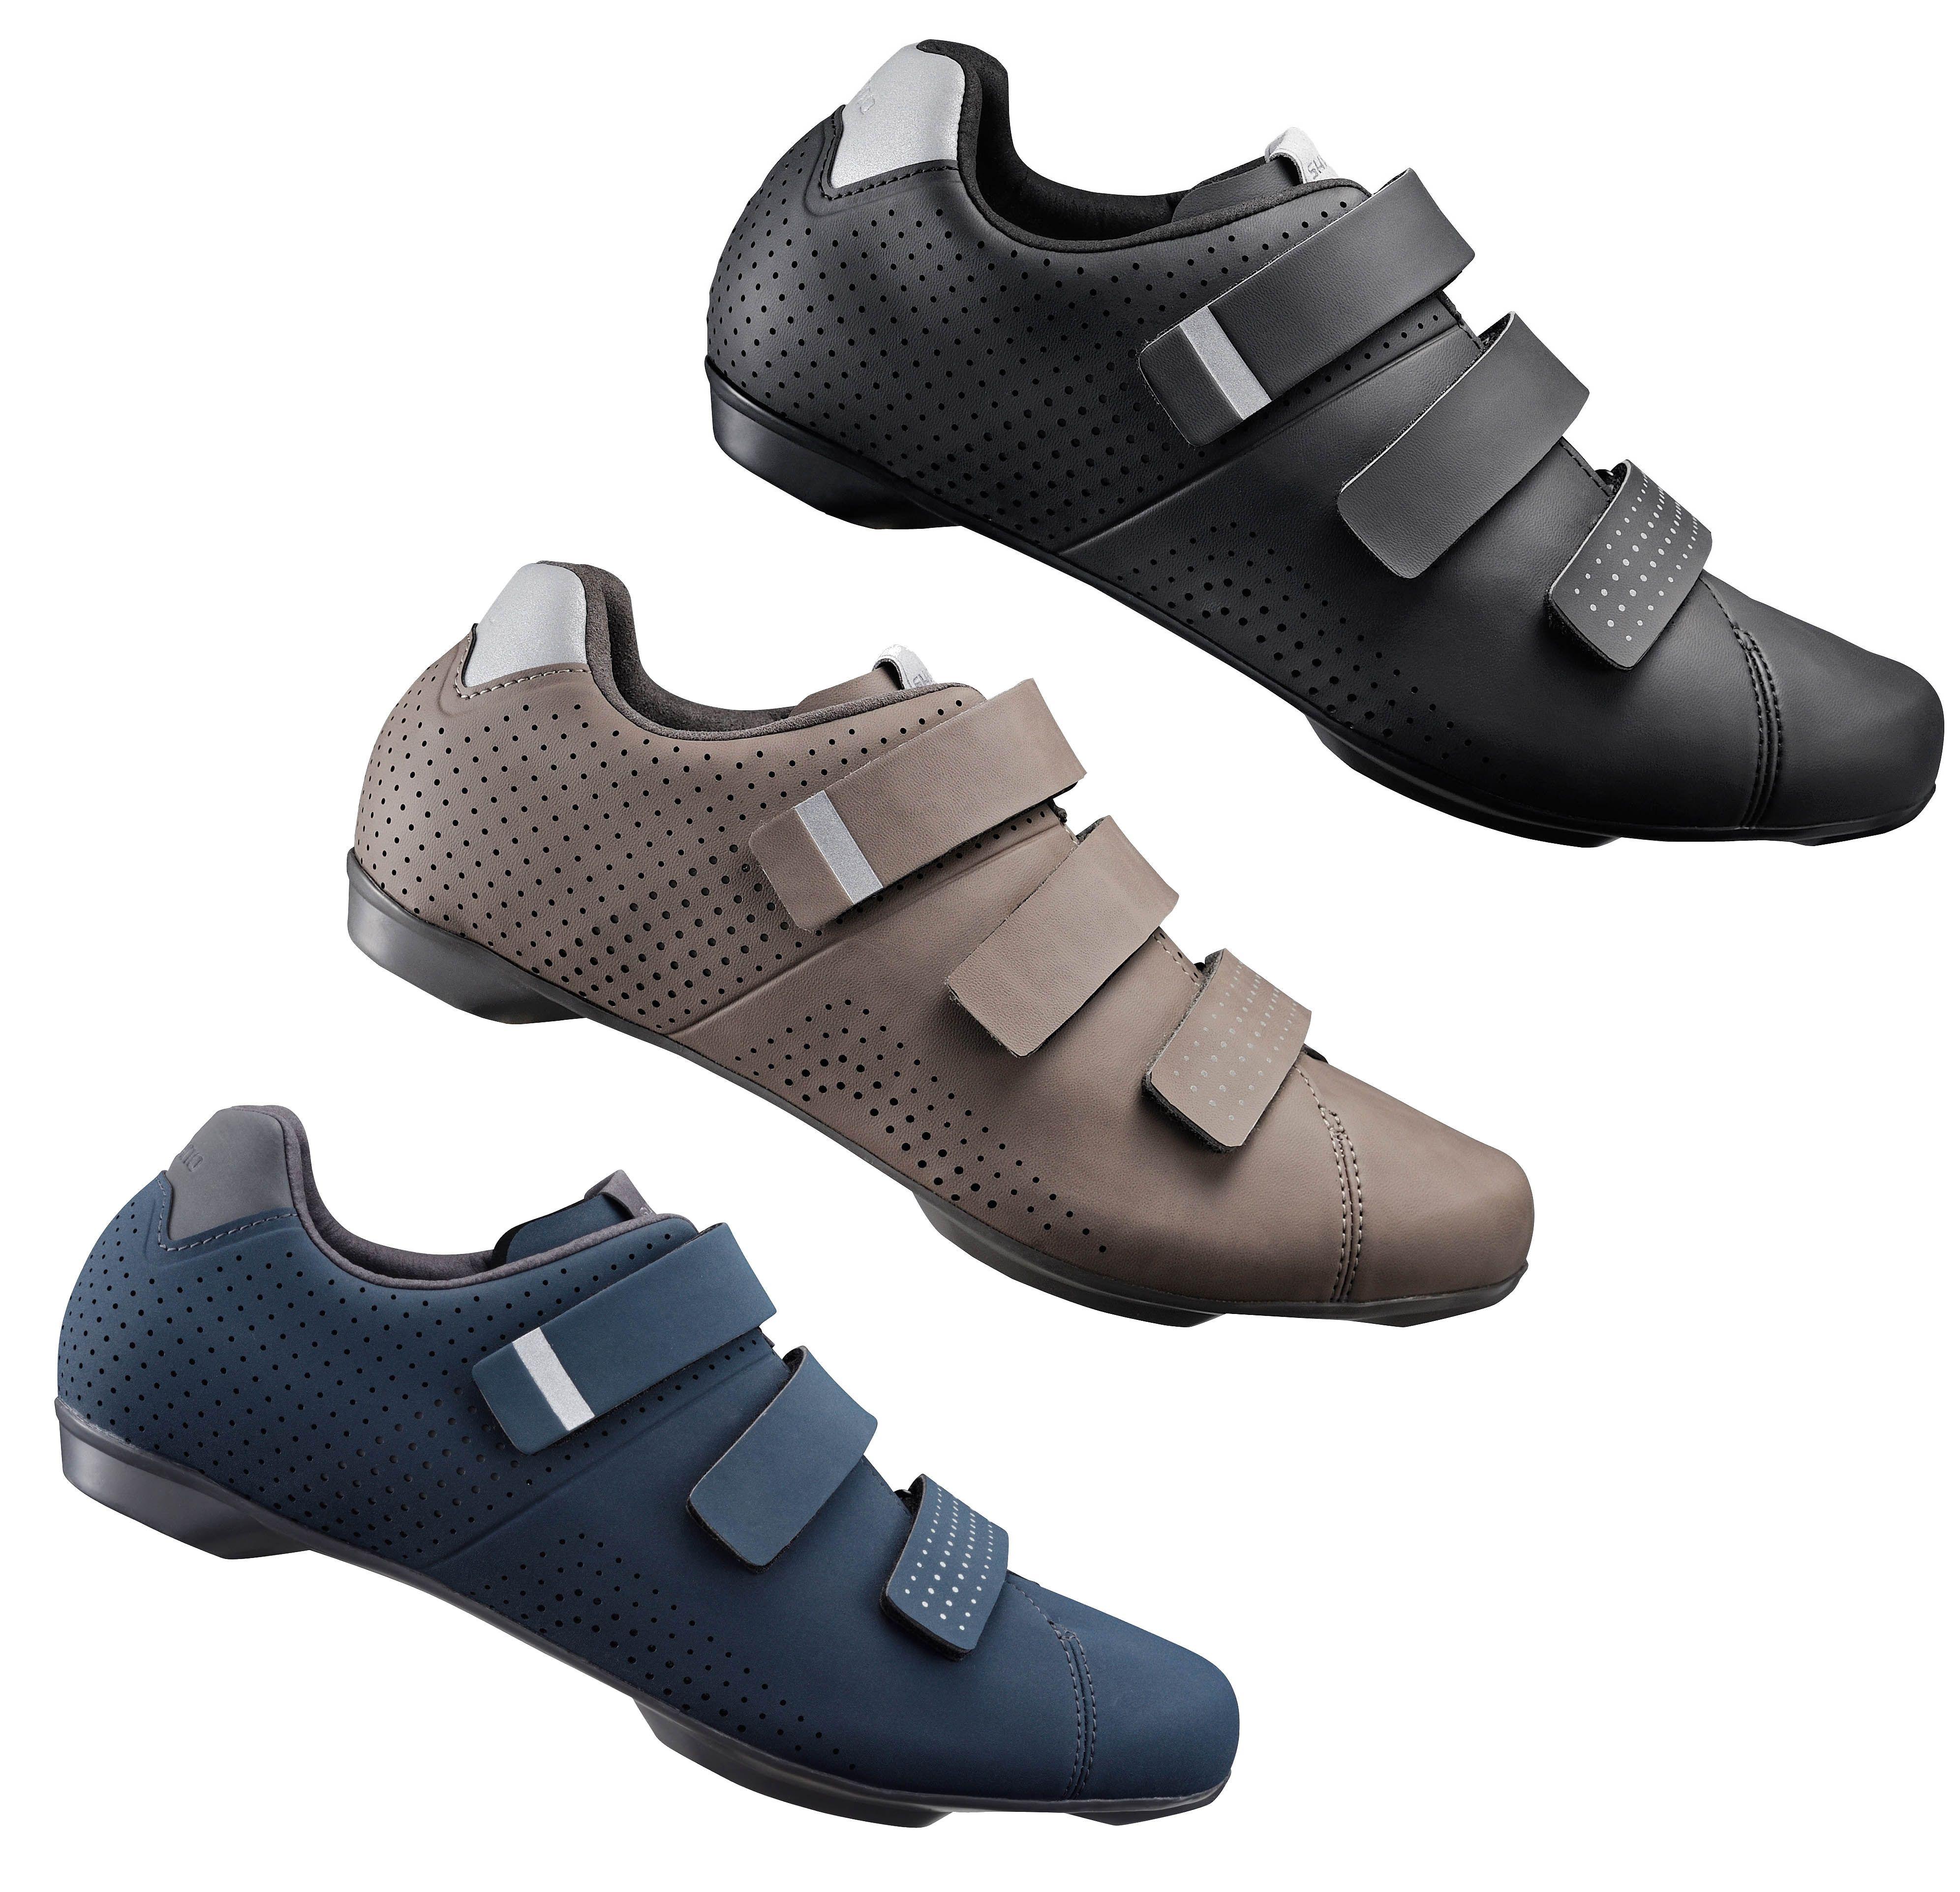 Shimano Rt5 Spd Road Shoes | Sko